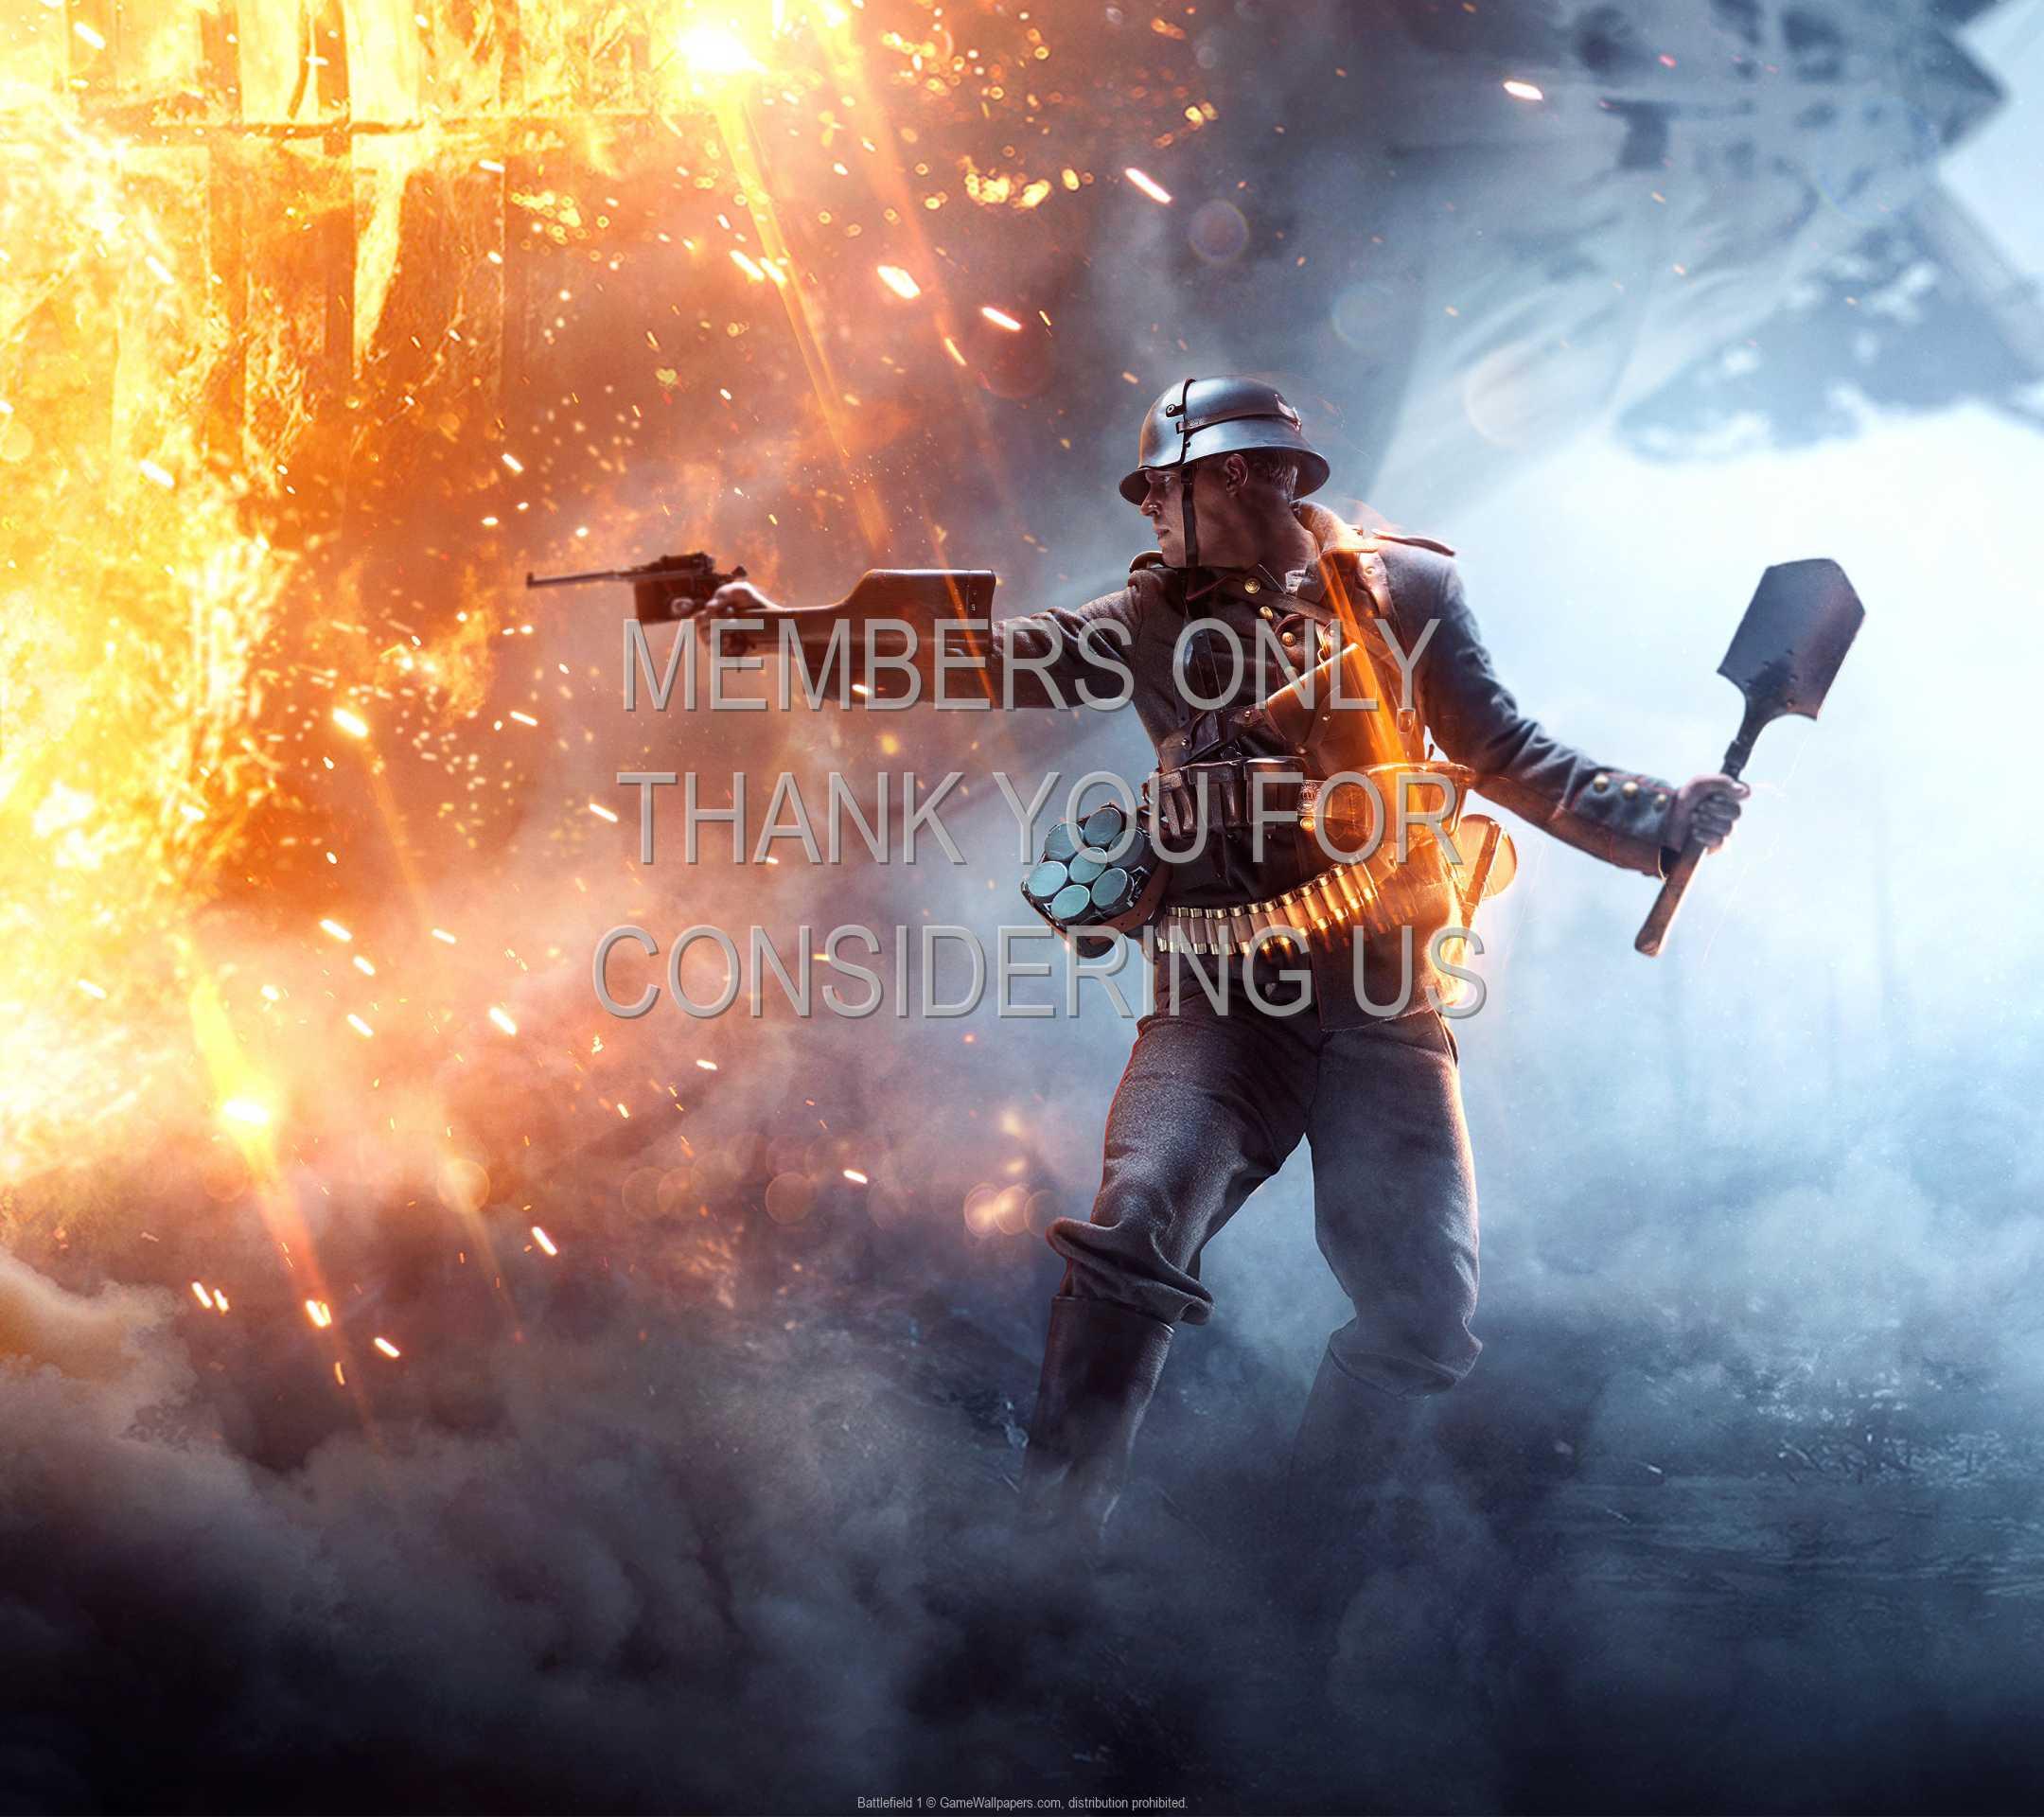 Battlefield 1 1080p Horizontal Mobile wallpaper or background 05